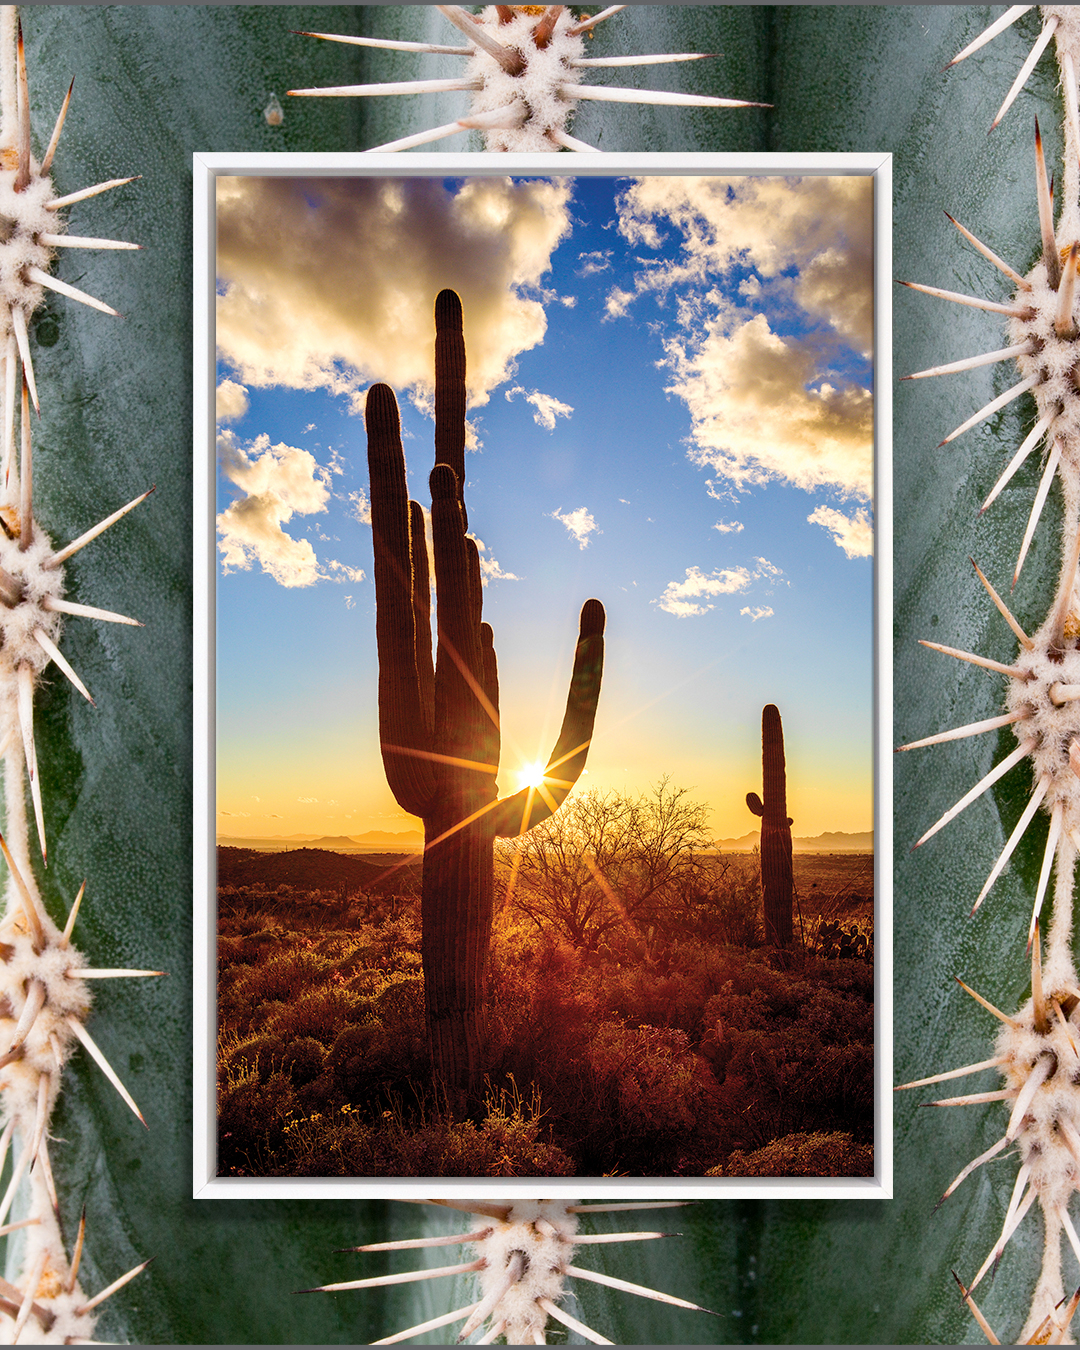 Cactus at sunrise by iCanvas artist Susanne Kremer